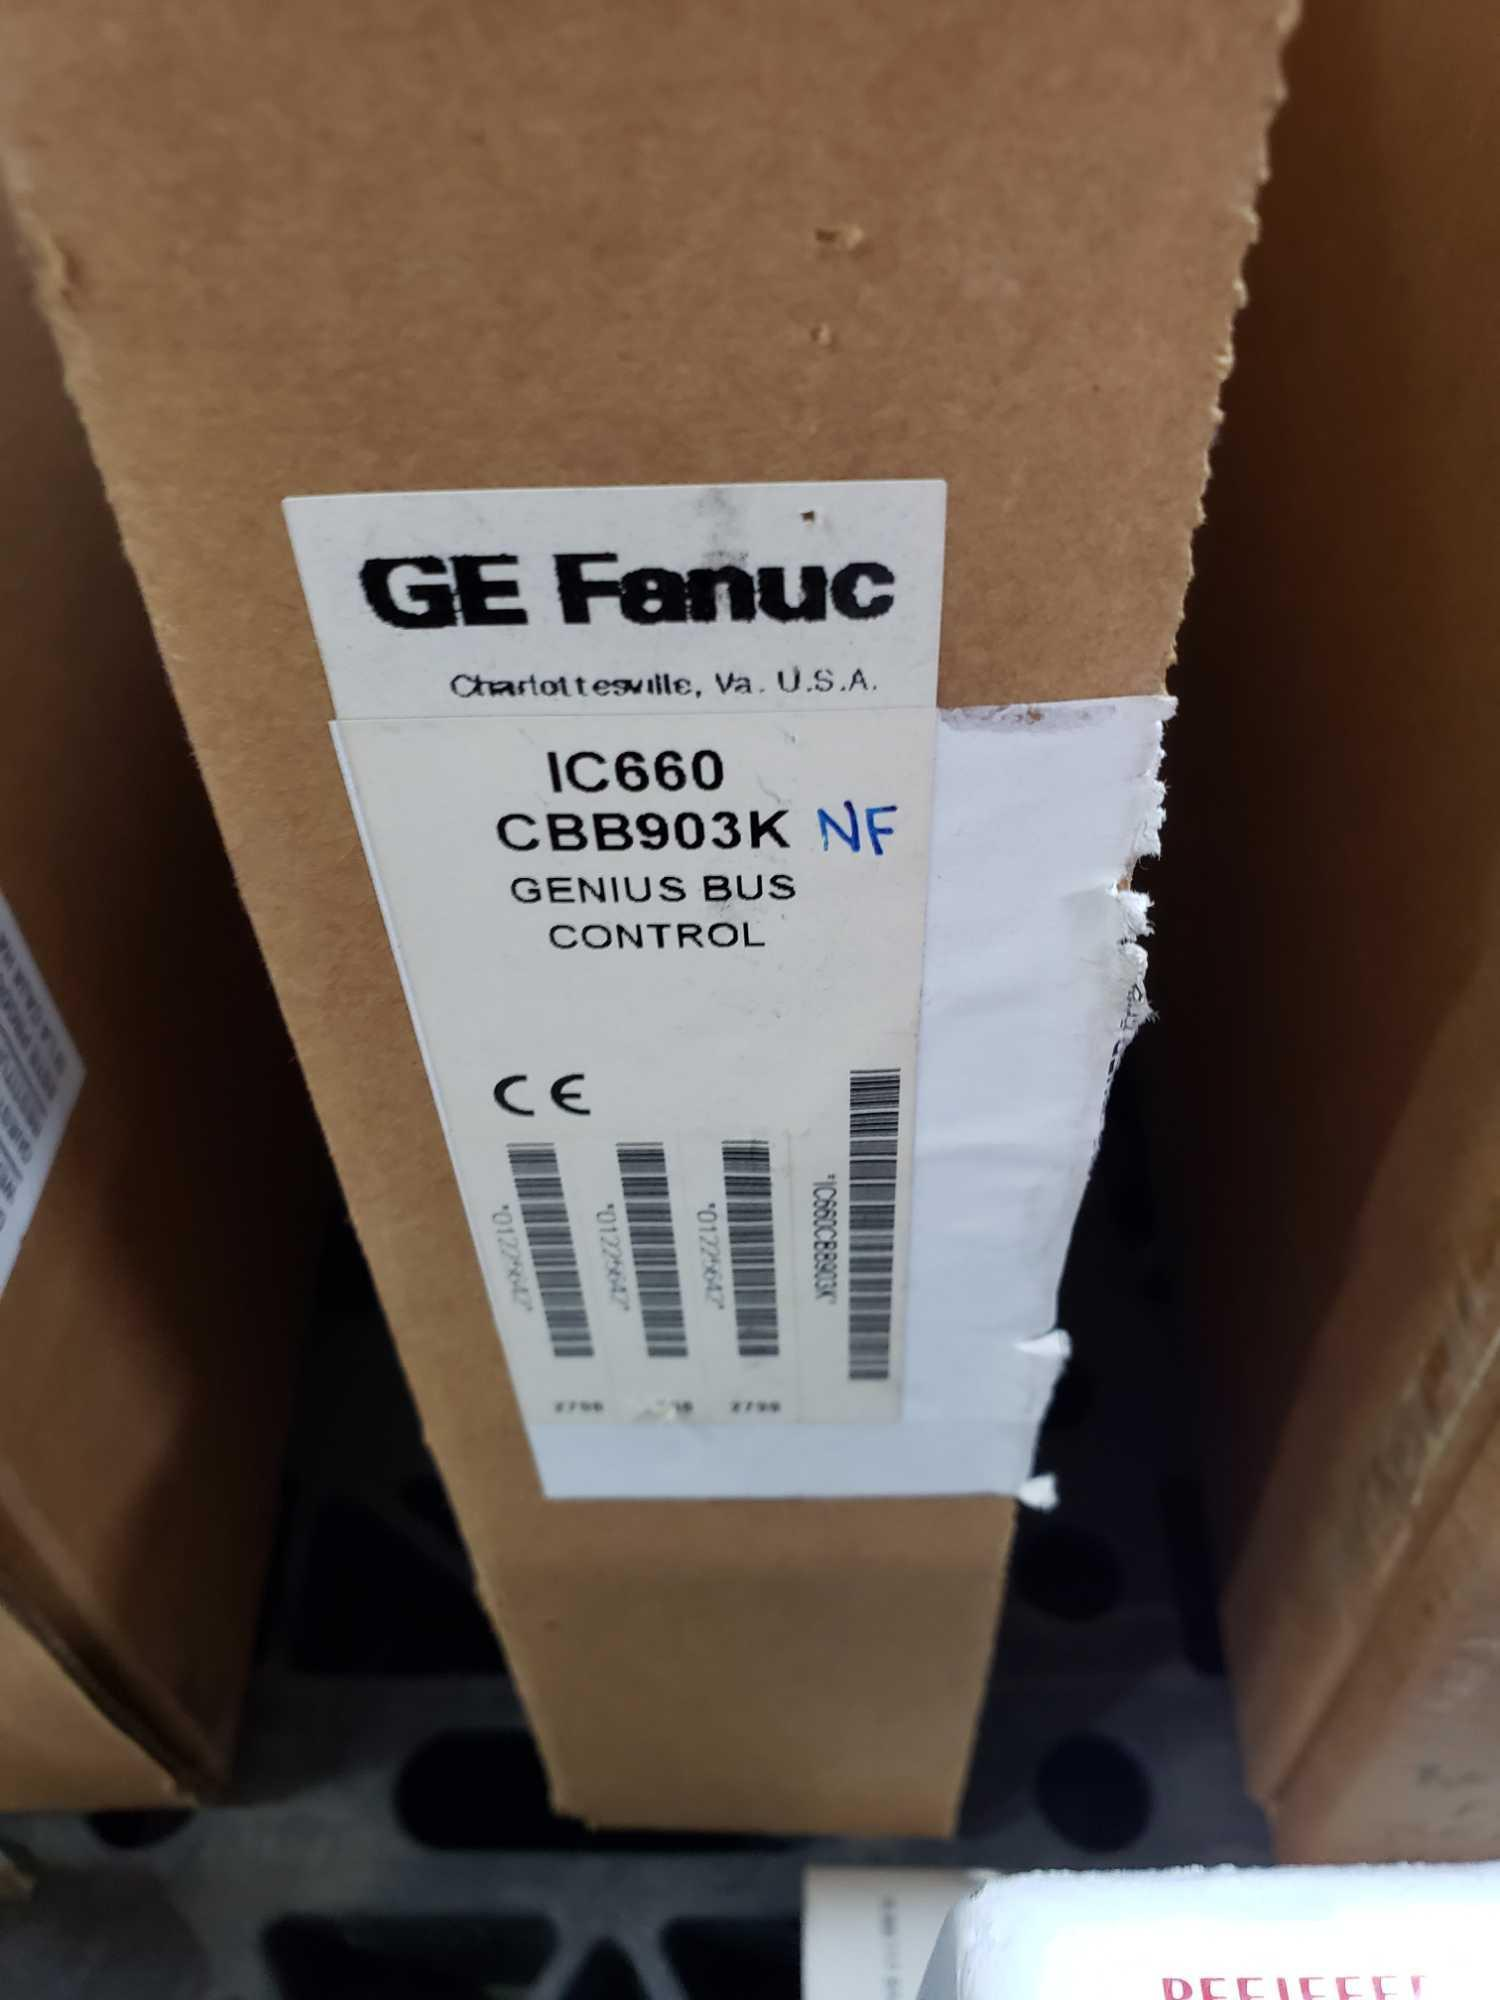 Lot 362 - GE Fanuc model IC660CBB903K genius bus control. New in open box.